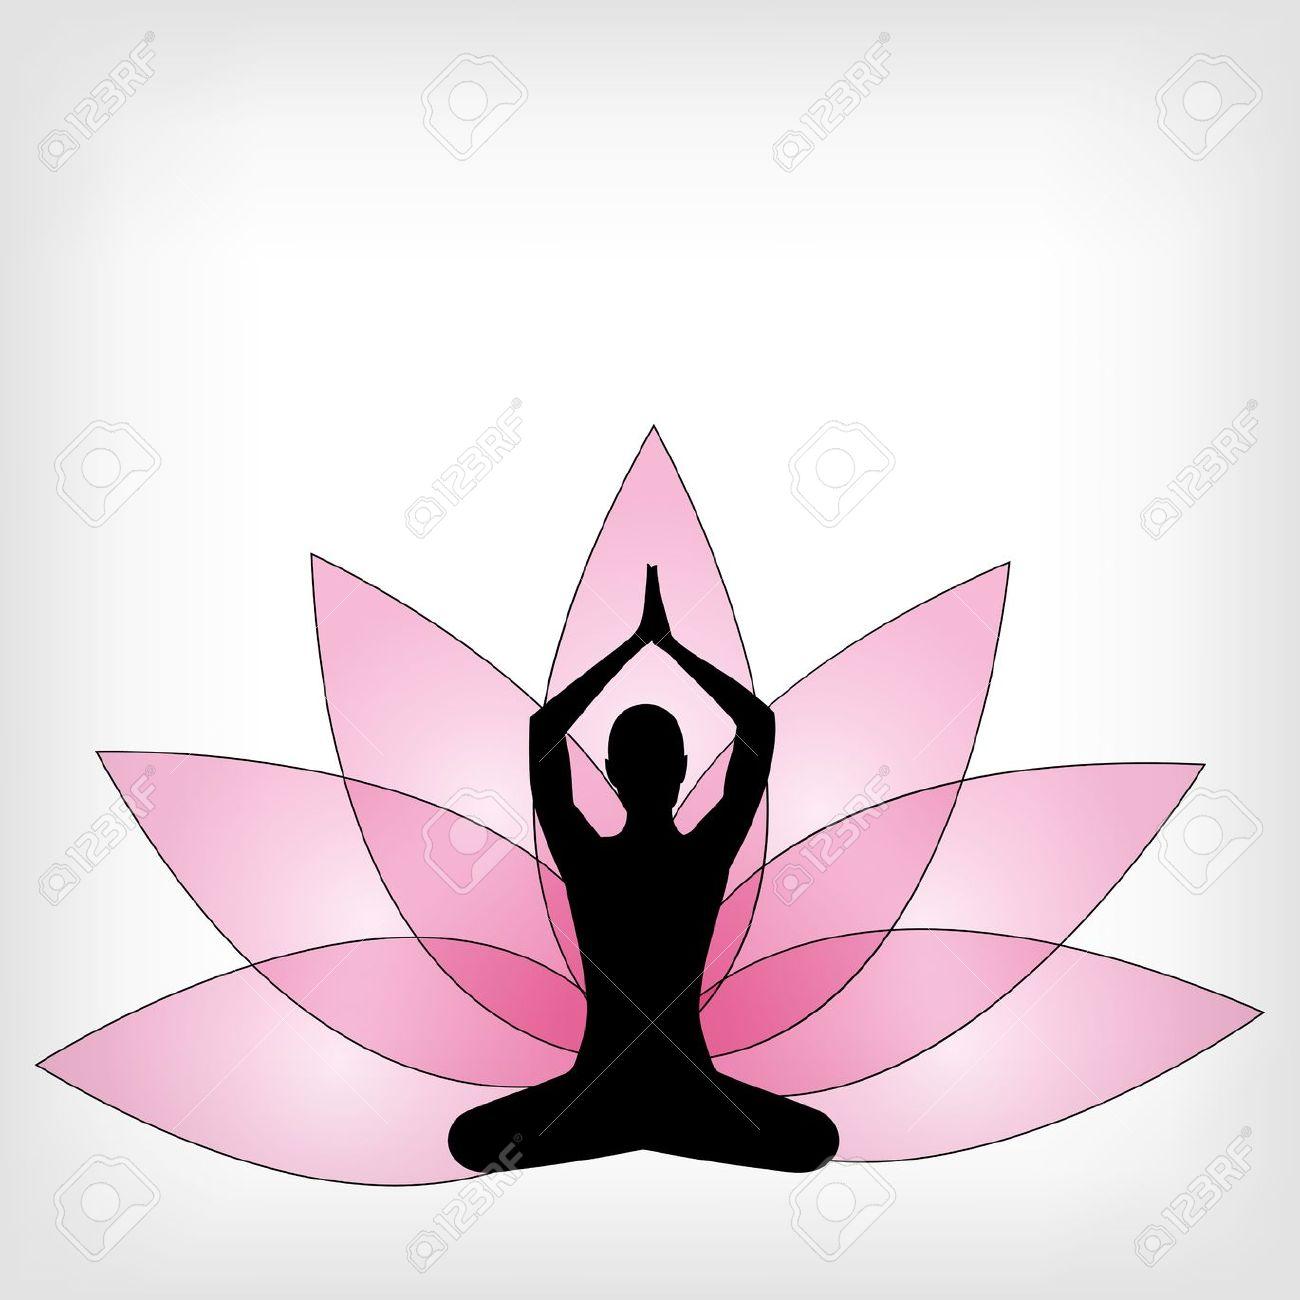 Meditation yoga clipart.